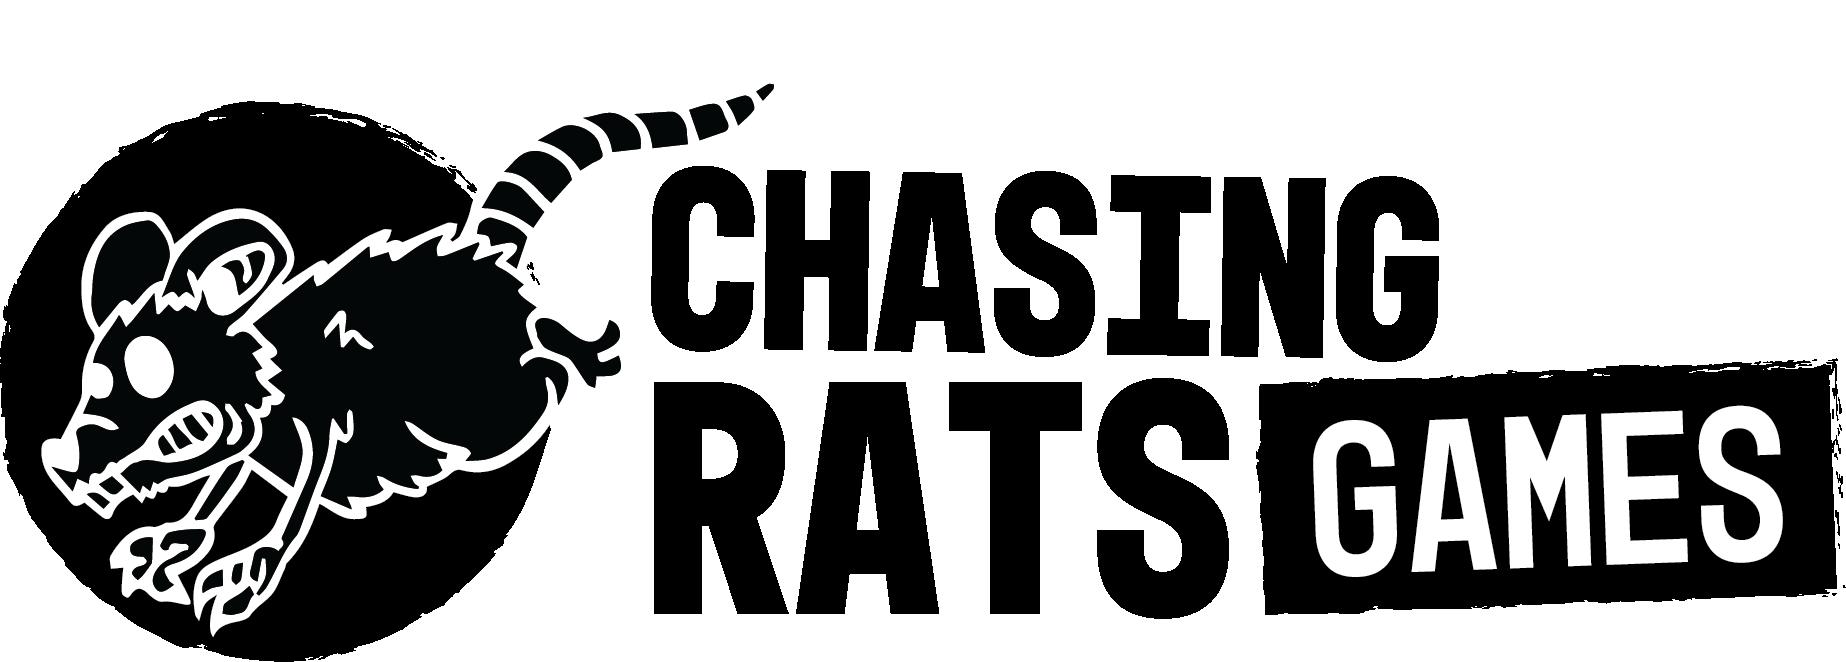 ChasingRatsGames_Logo.png